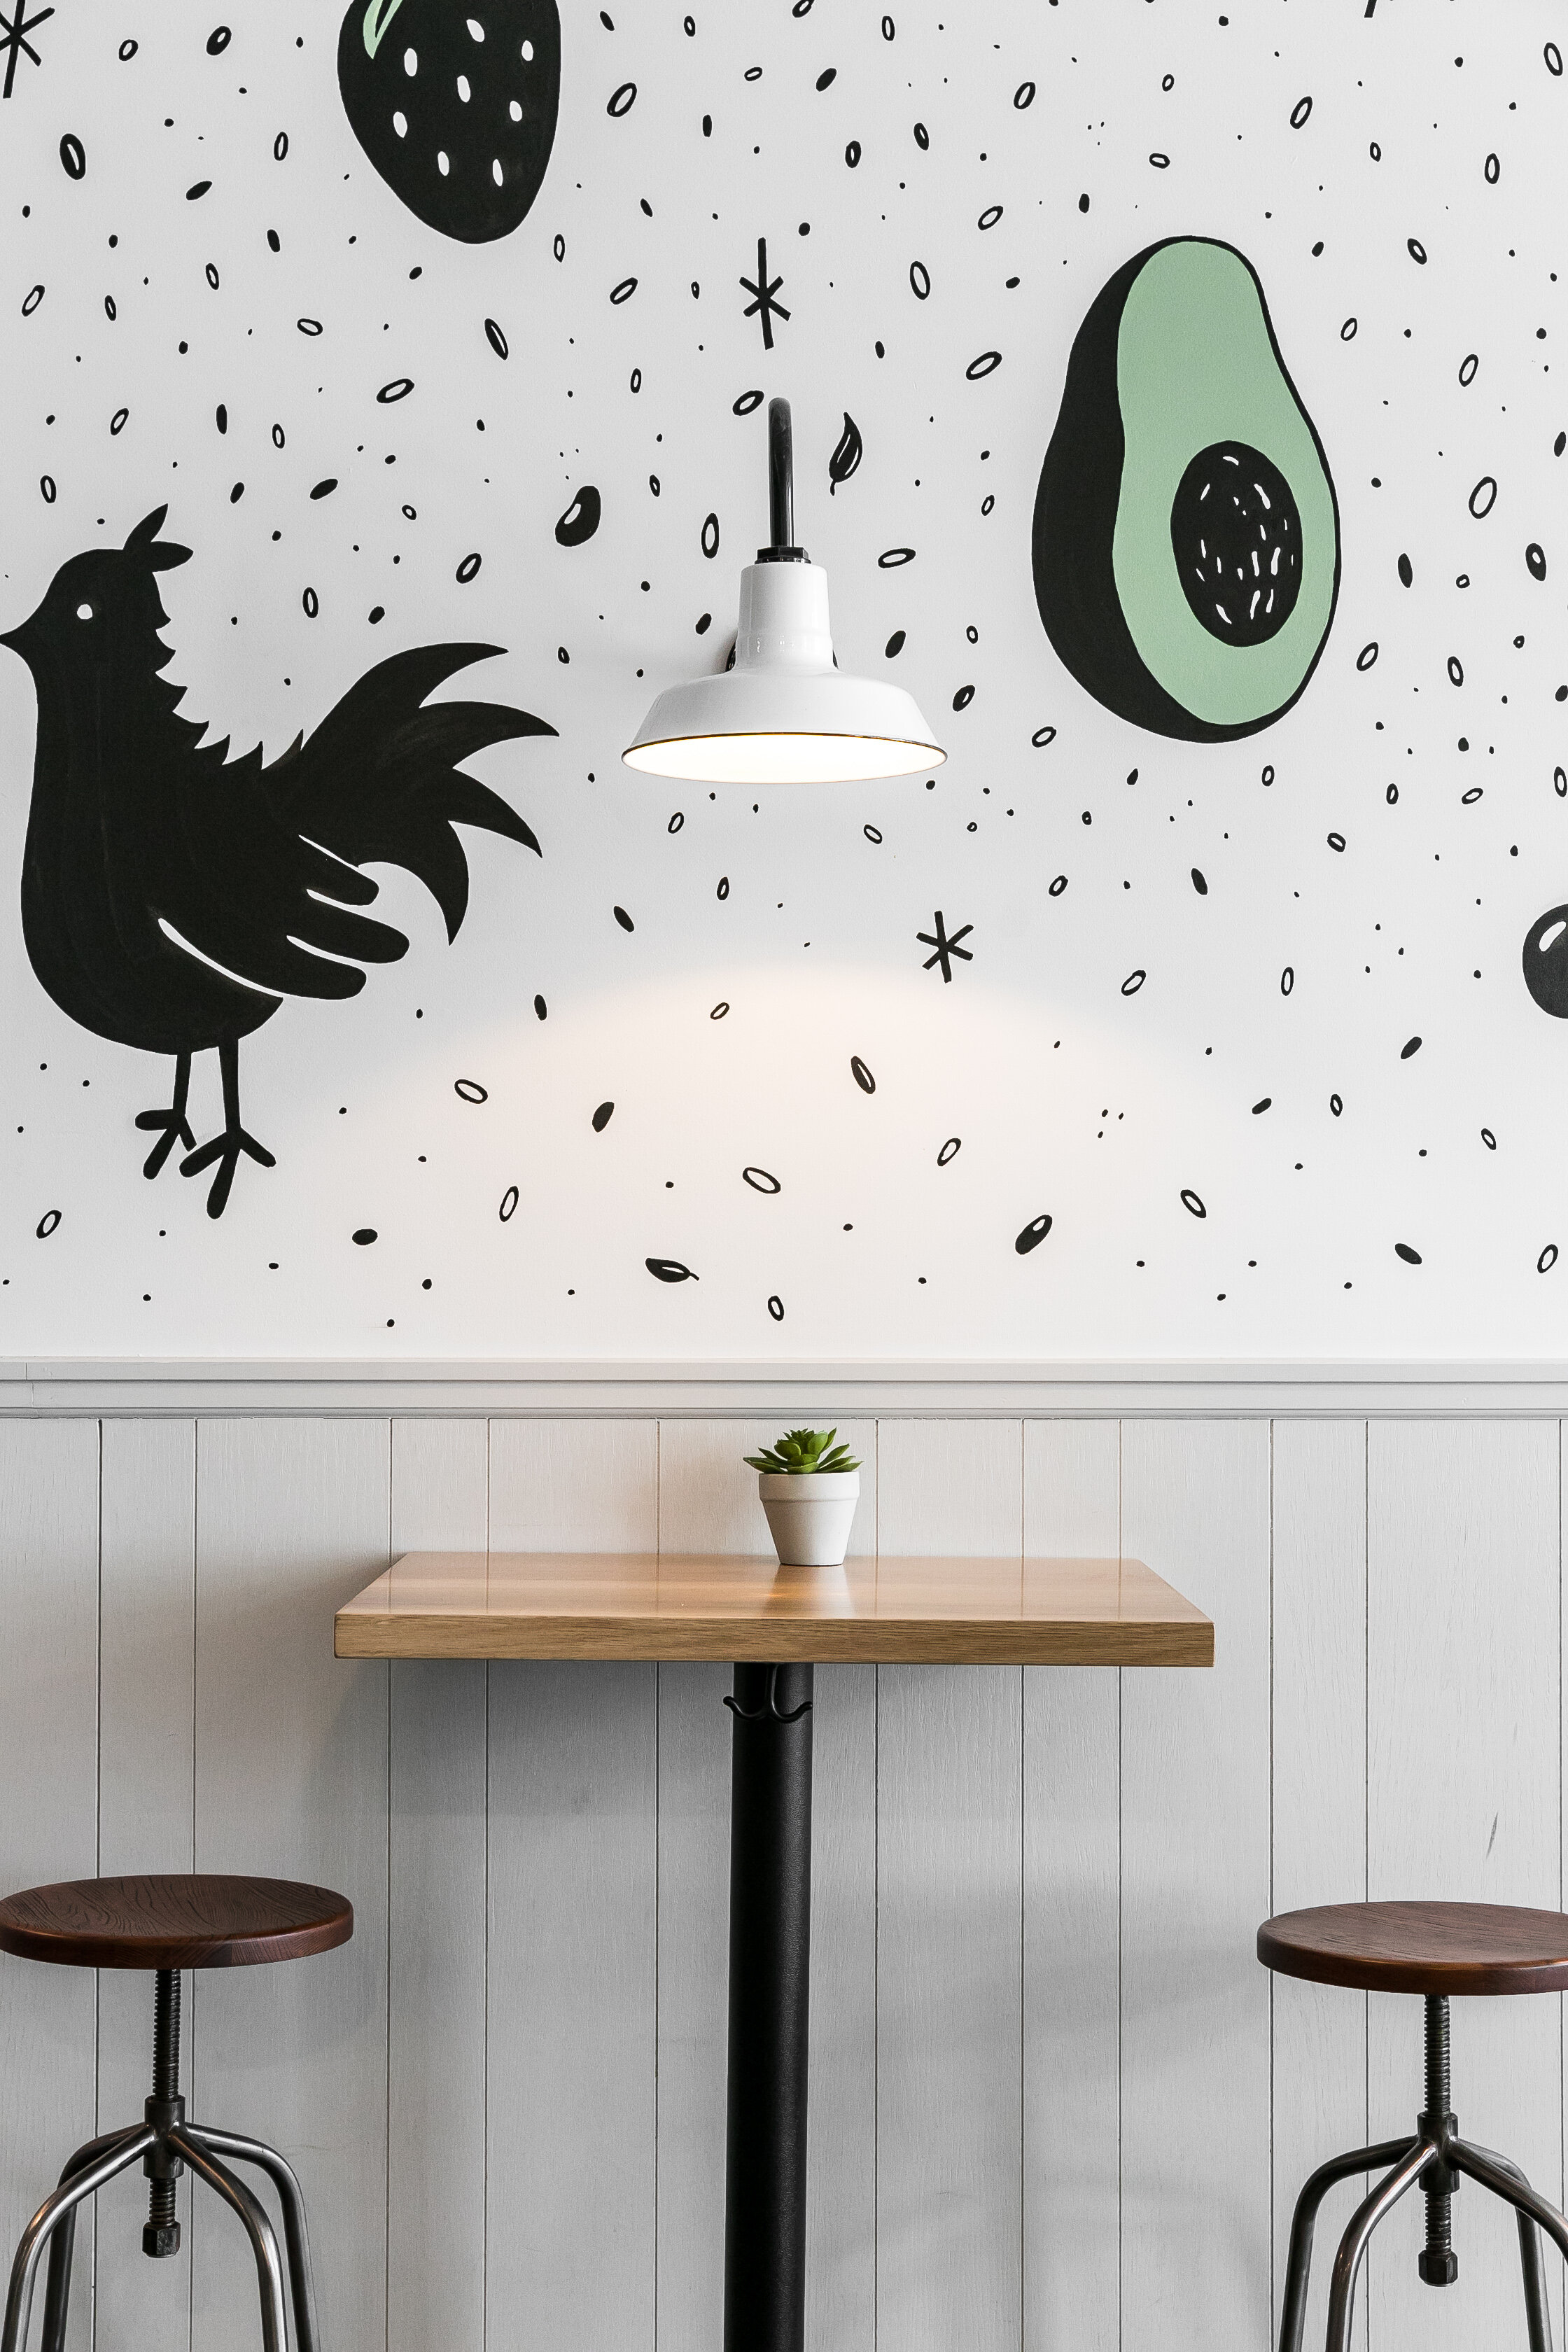 Butterbean Cafe Case Study Branding Web Design Interior Design Studio In Richmond Virginia Campfire Co